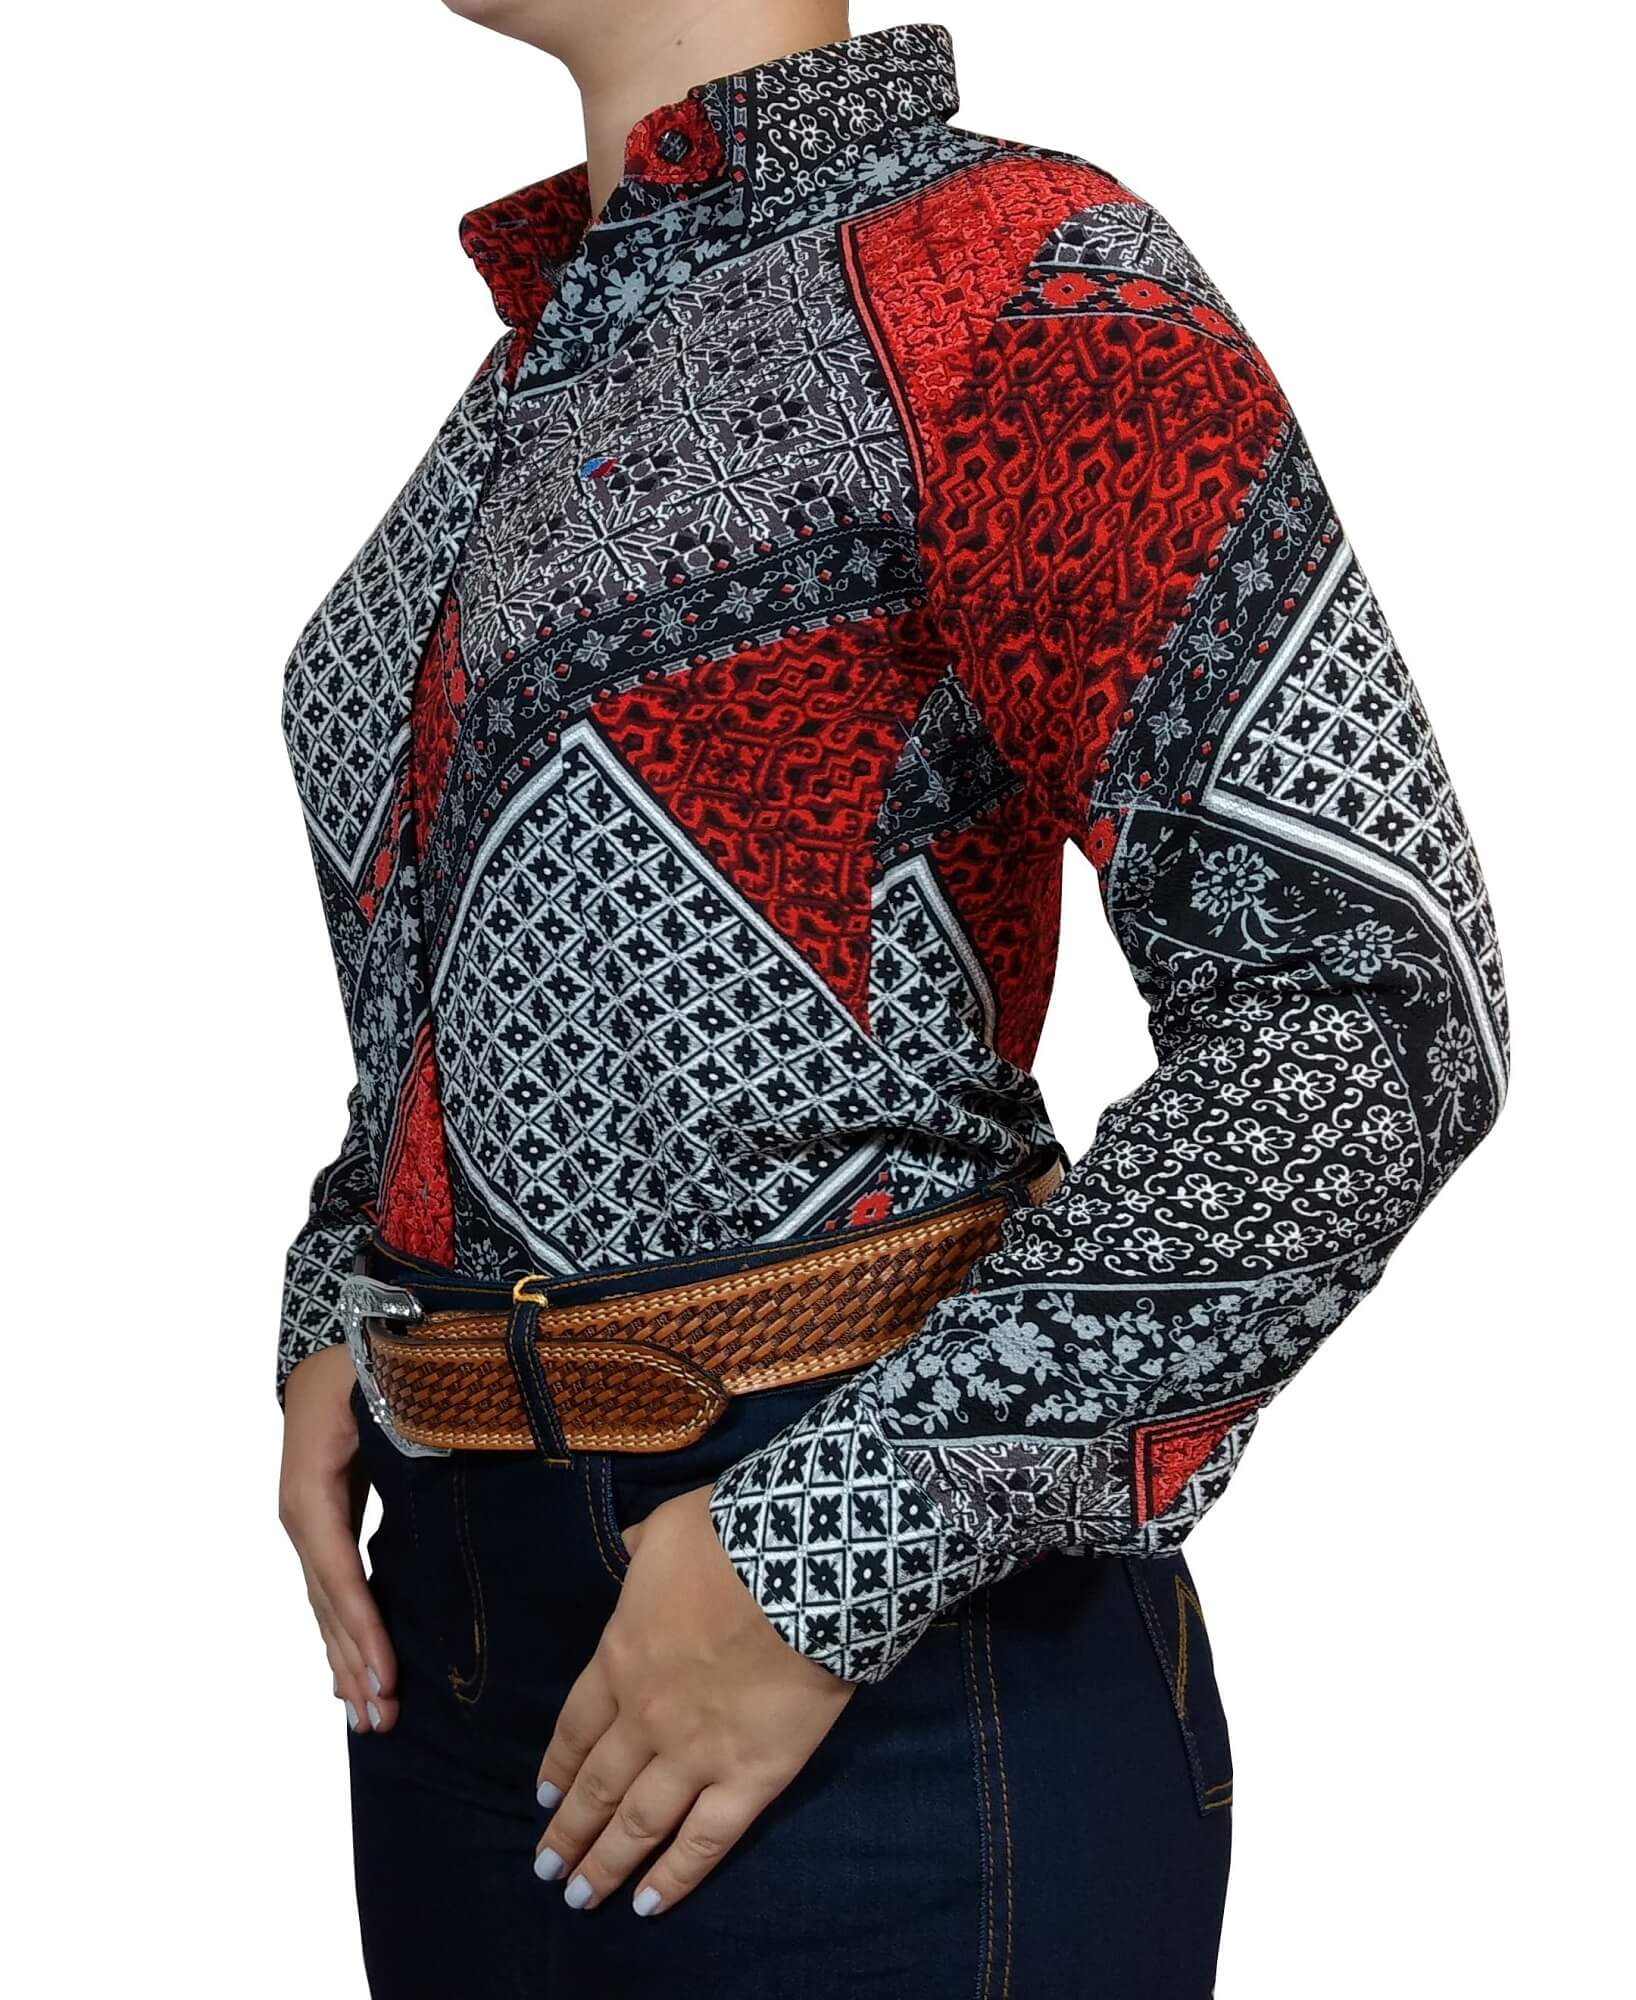 Camisa Feminina Smith Brothers Viscose Floral Vermelha Ref. 01